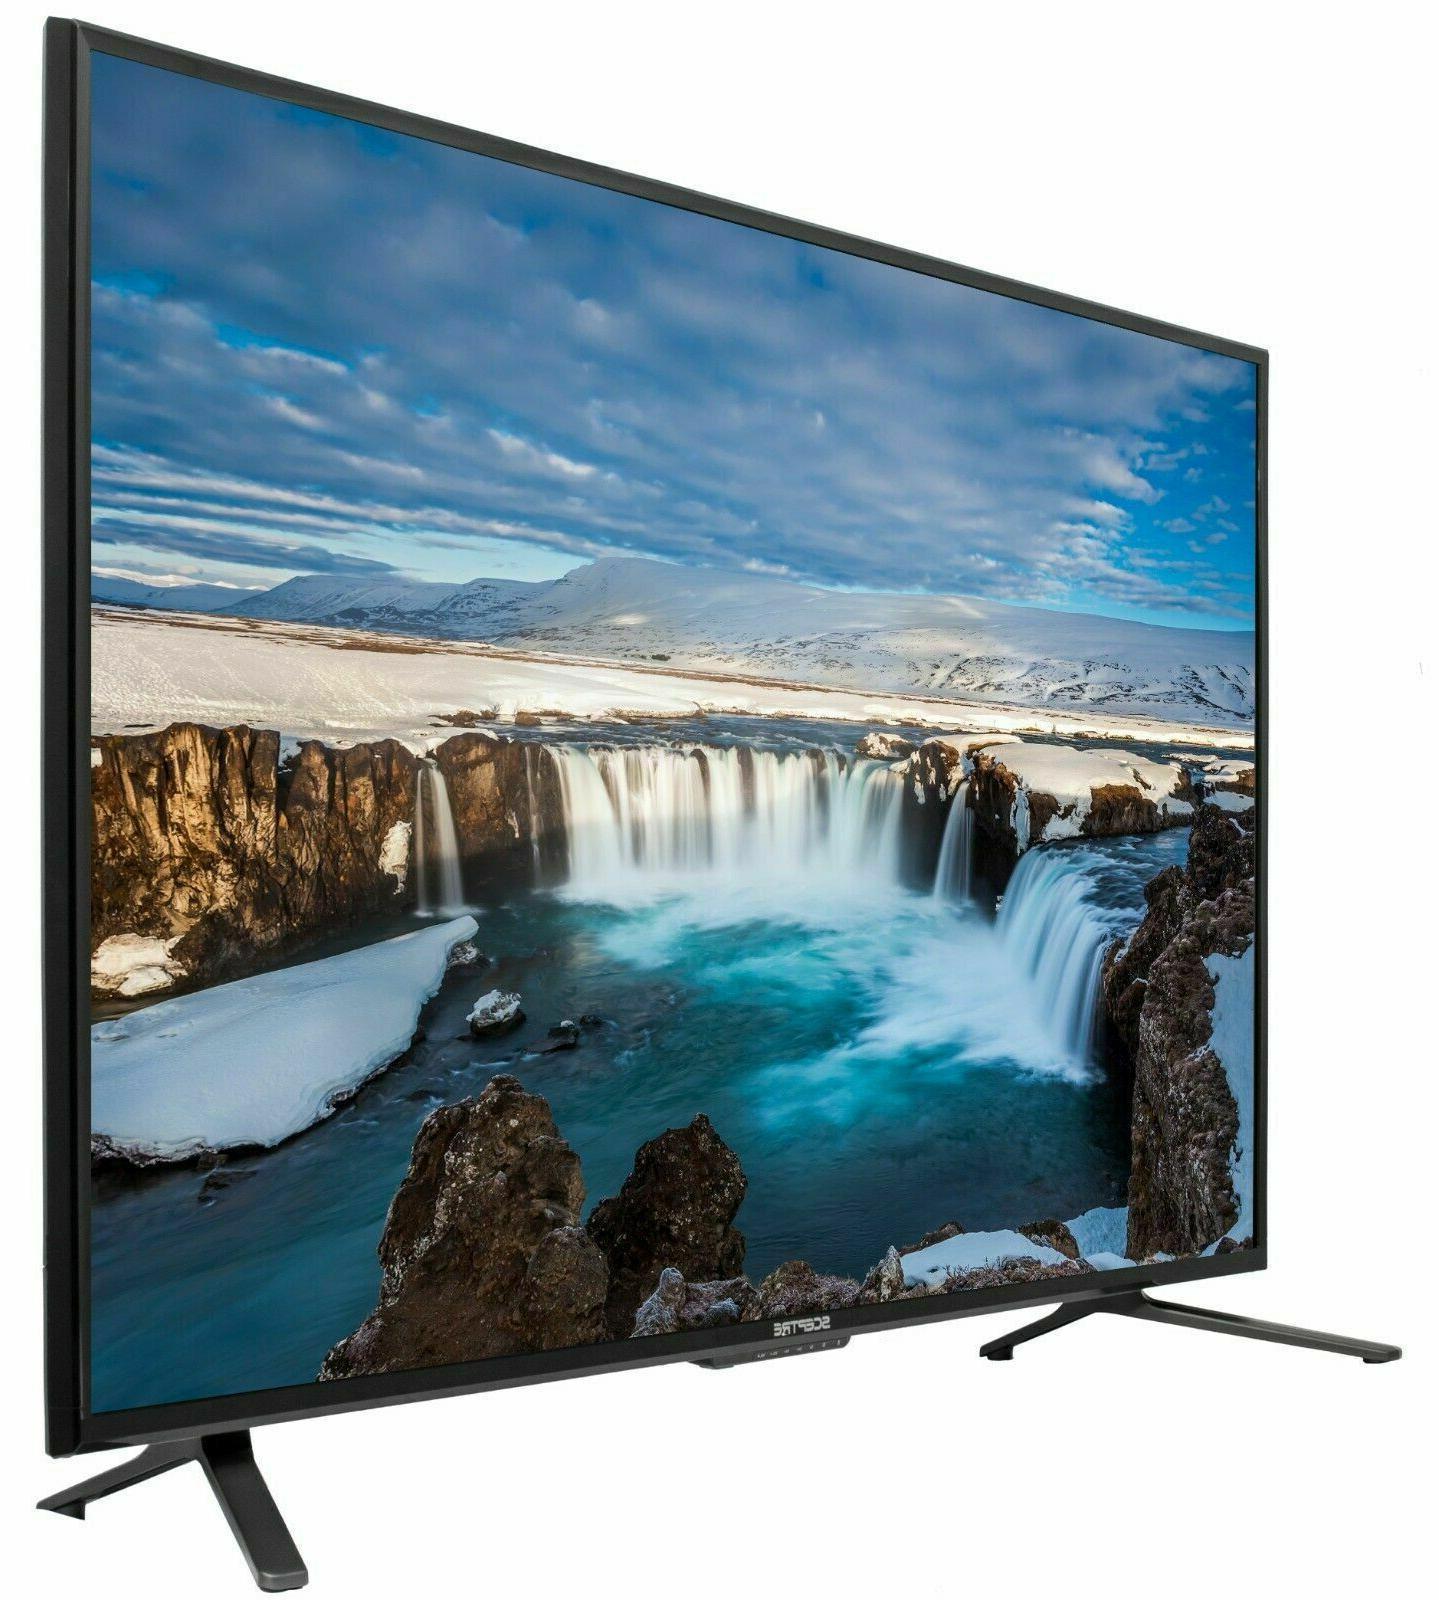 "HOT CLEARANCE DEAL 4K 55"" Inch HD 2160P HDMI"